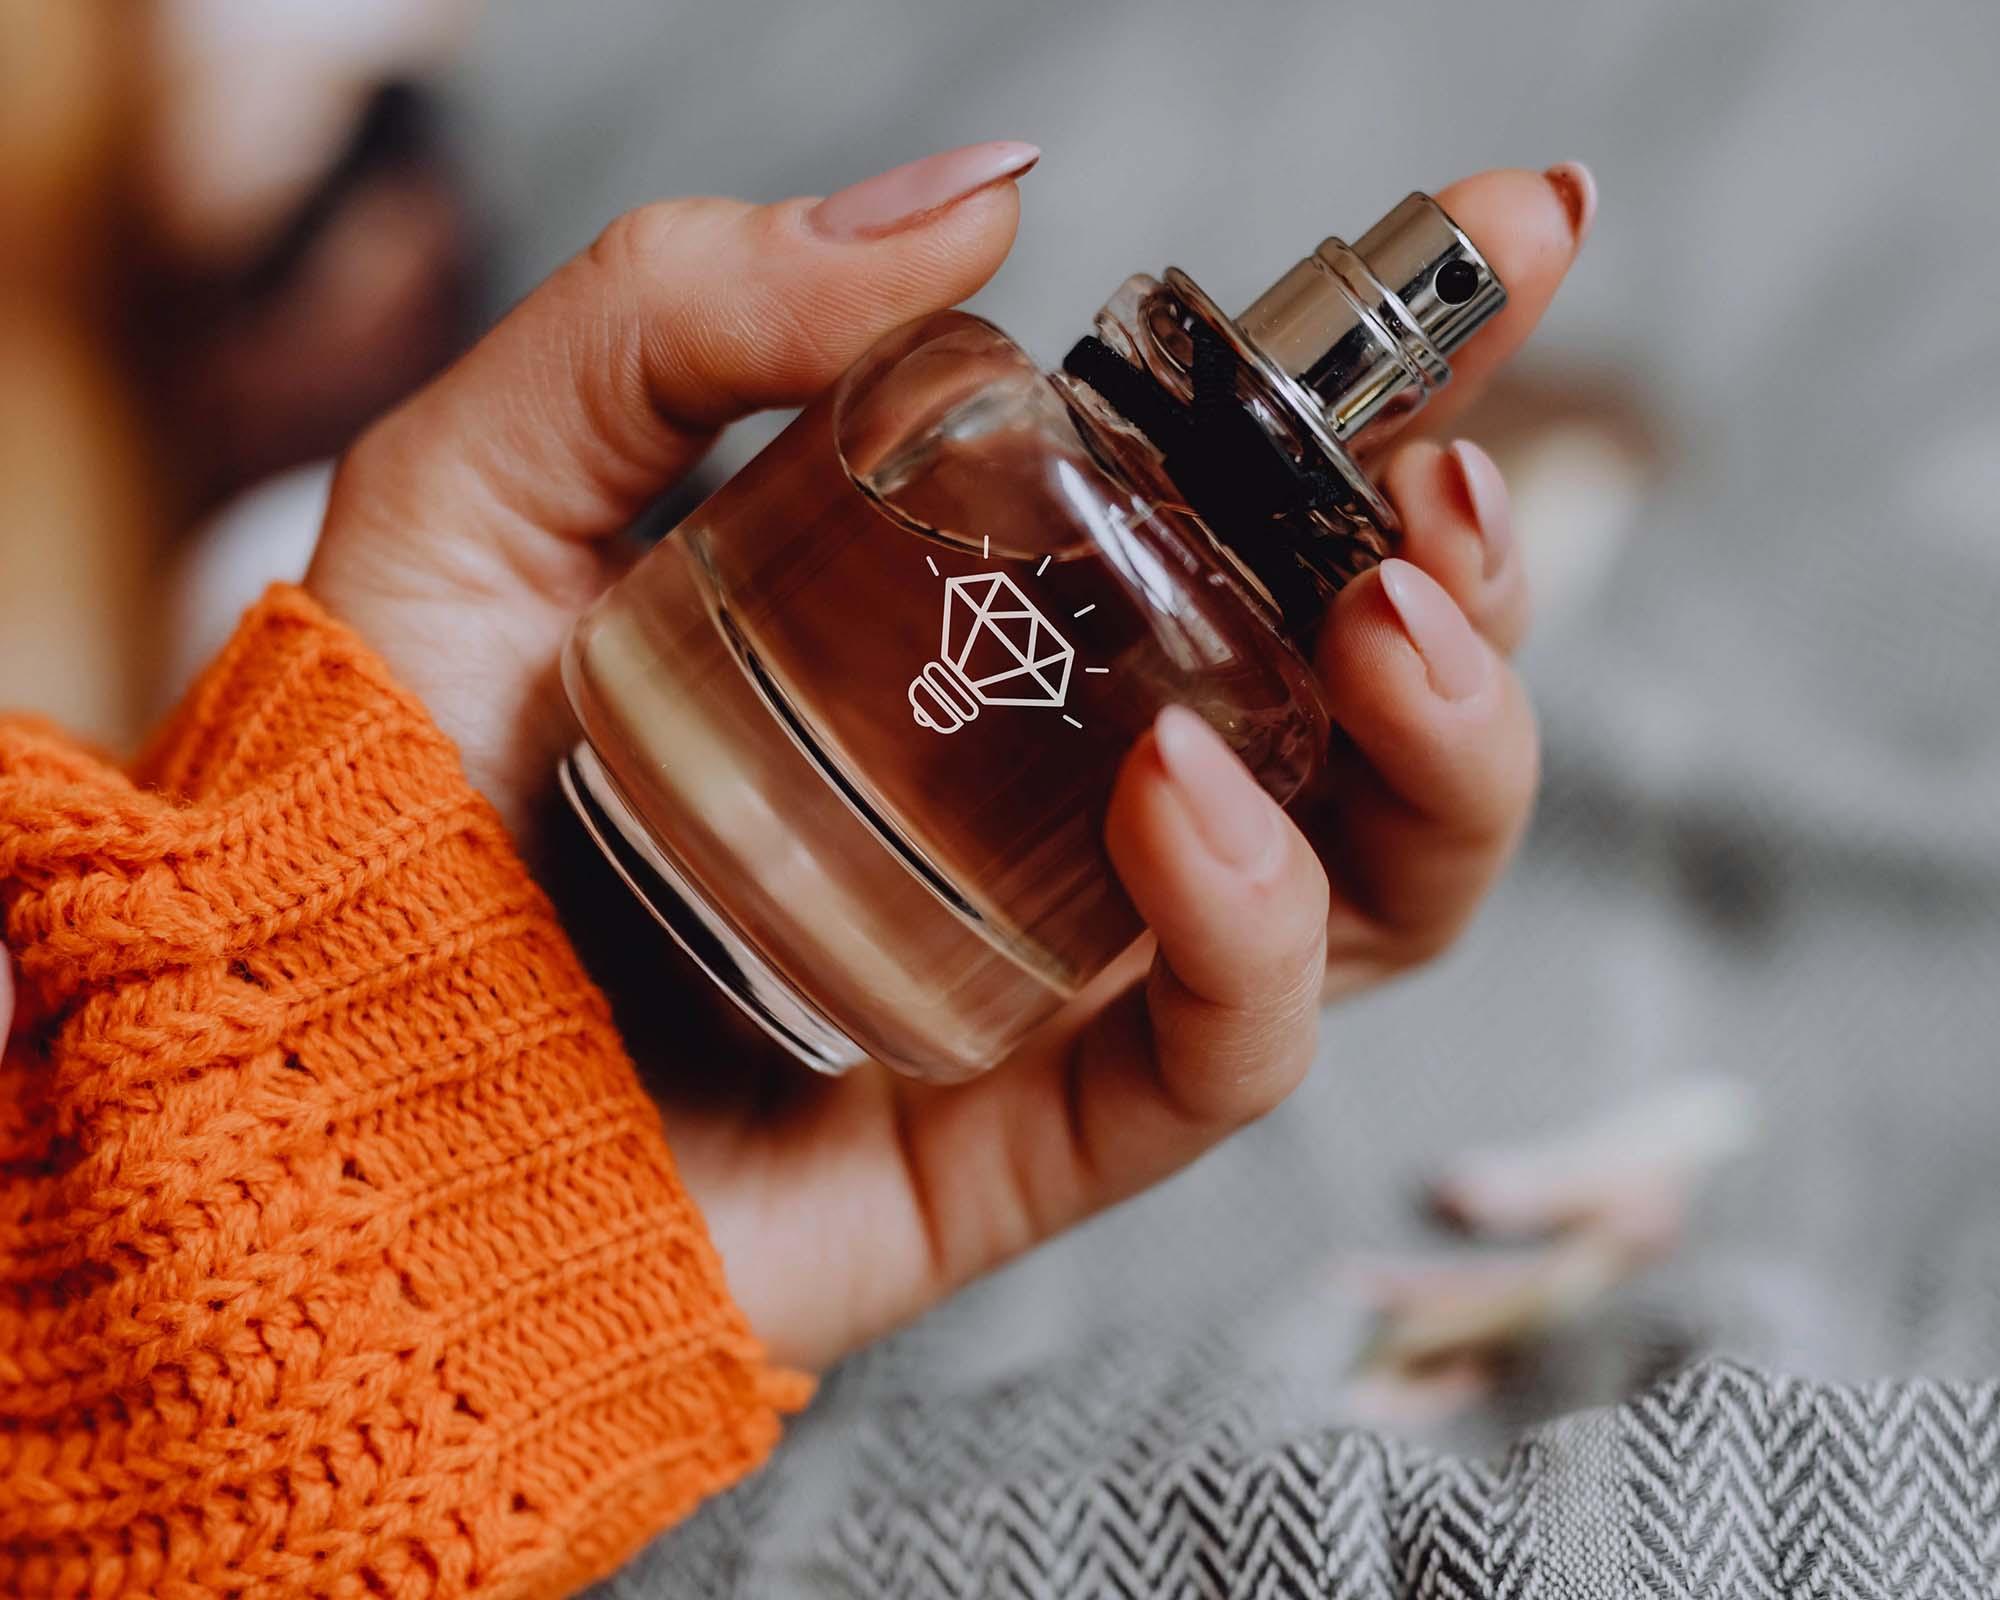 Perfume Held by a Hand Mockup